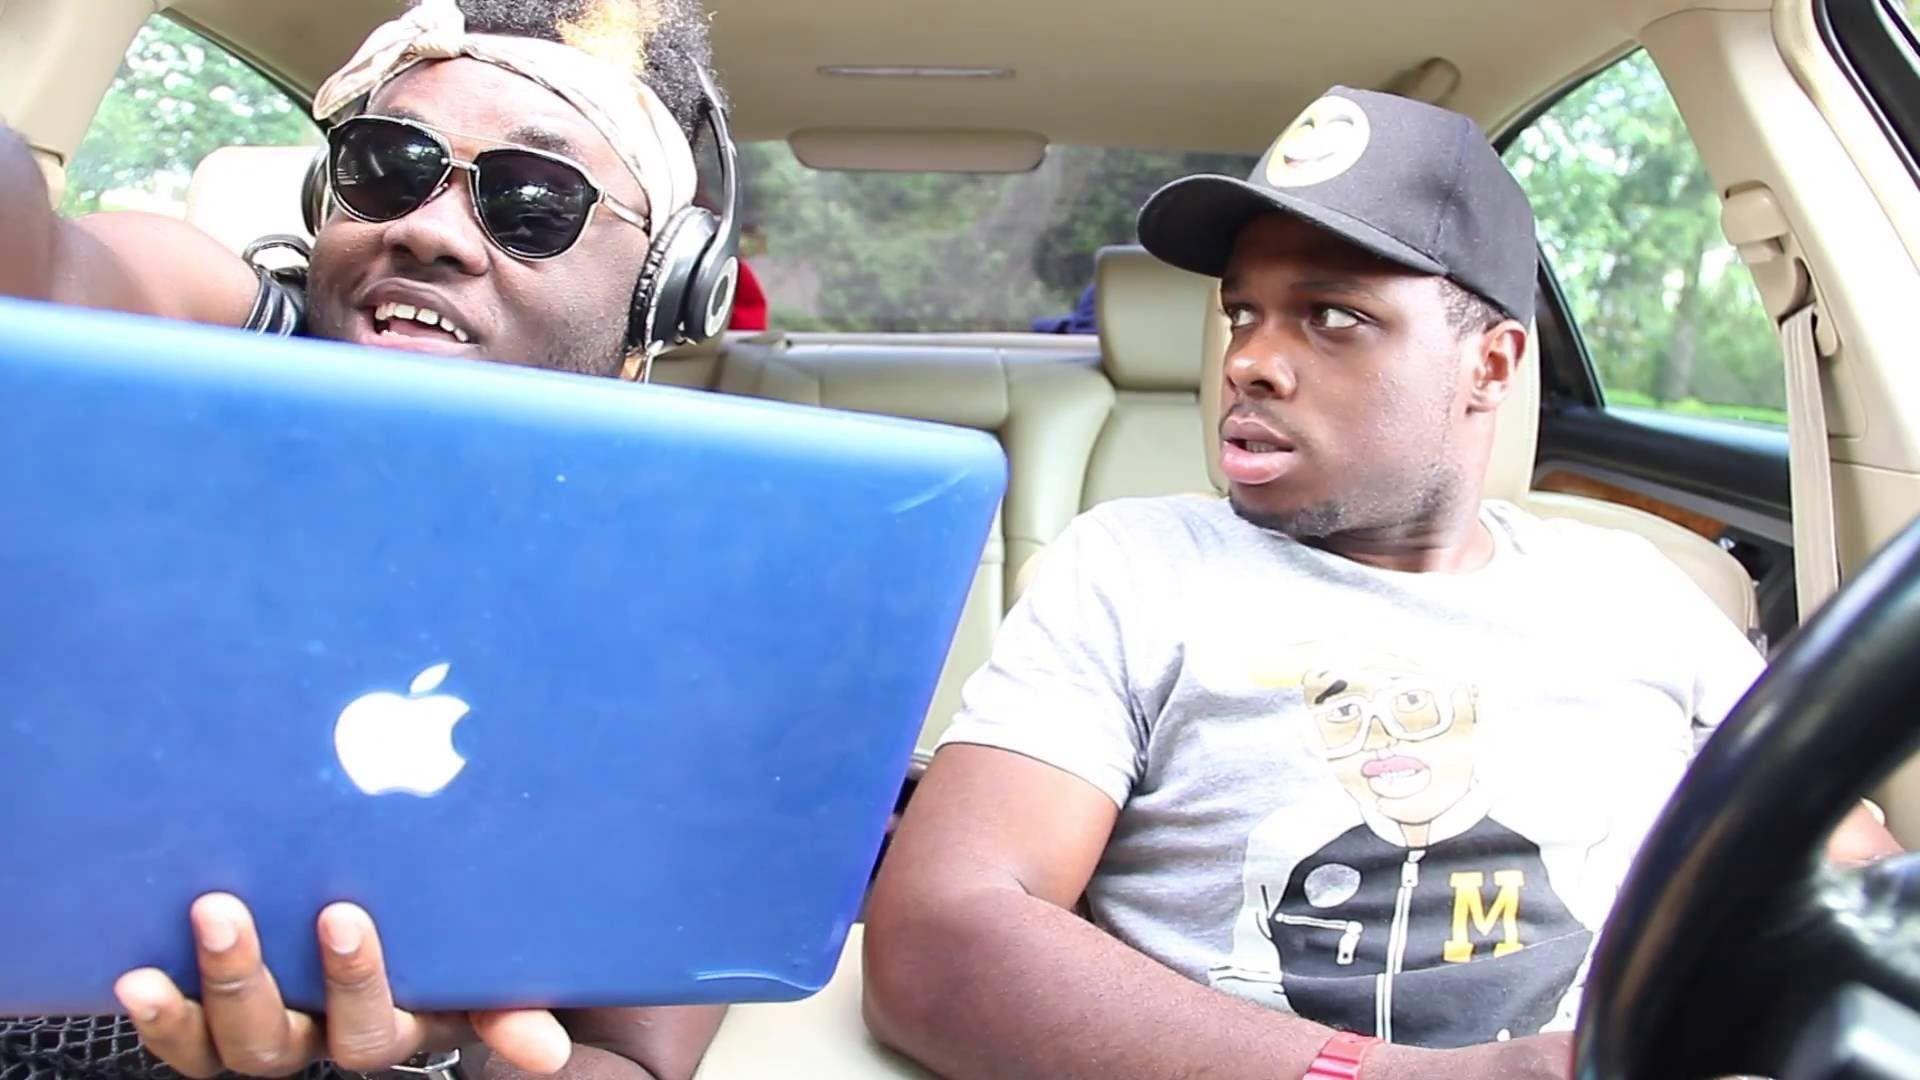 JAMAICAN DJ | Comedy Sketch | LTS TV